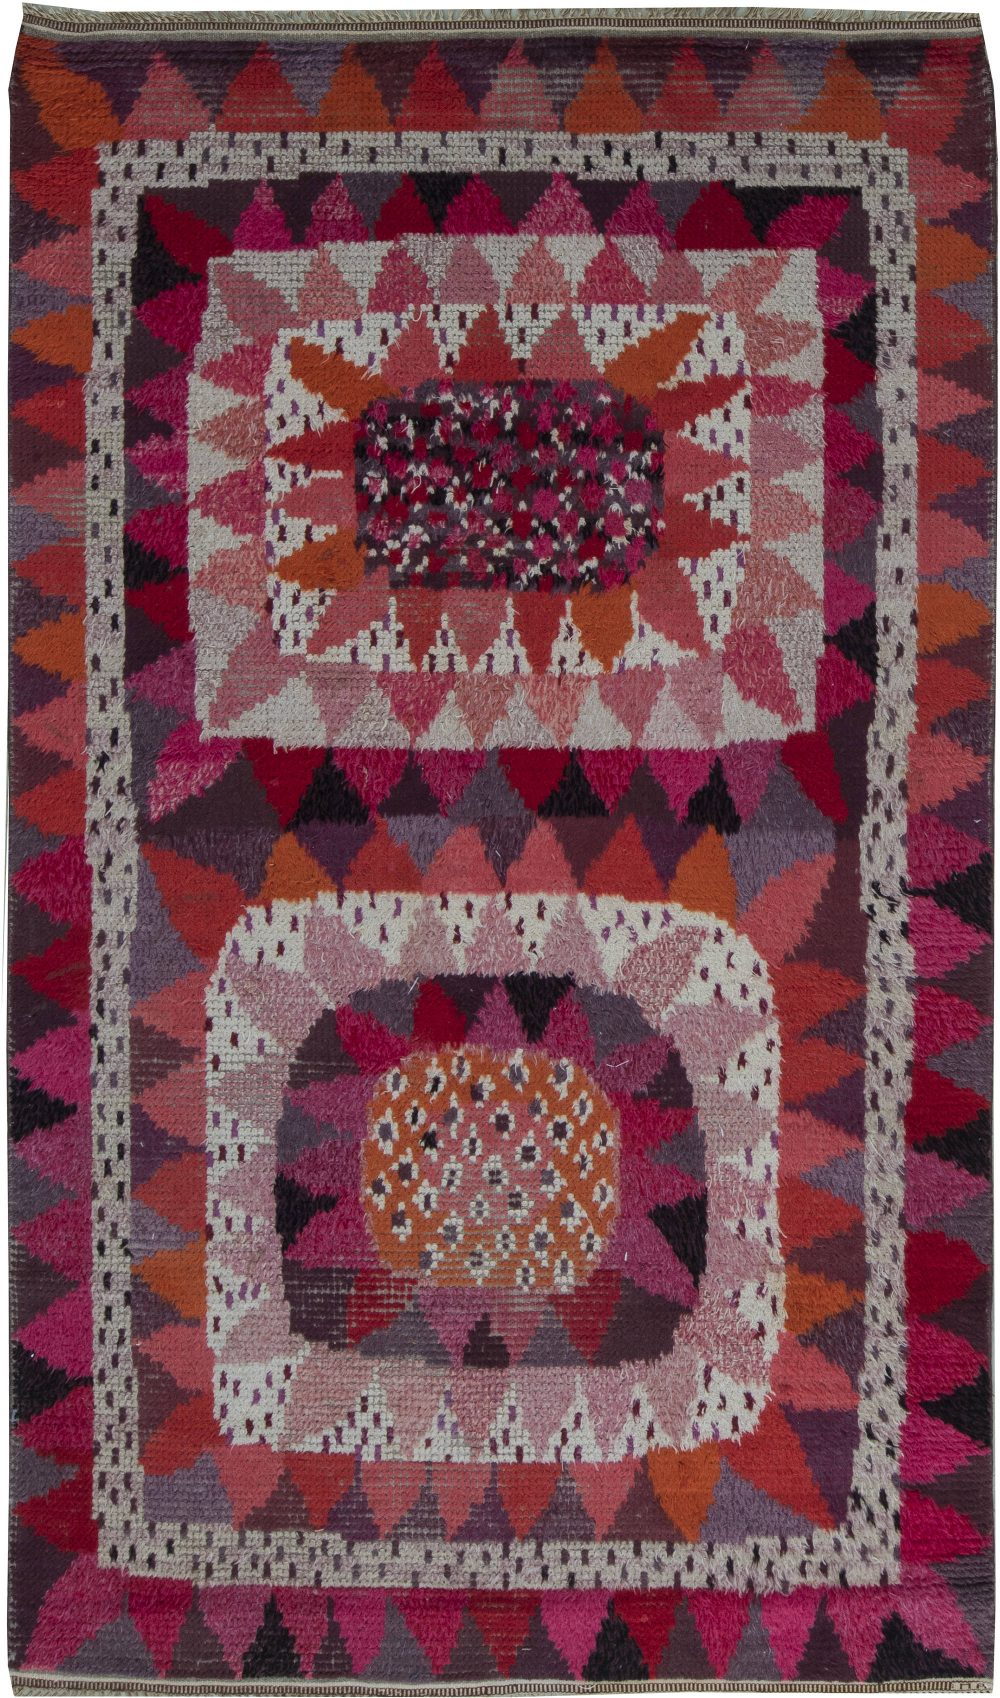 Solrosen Rya Rug by Marianne Richter in MMF Workshop (Size Adjusted) BB6362